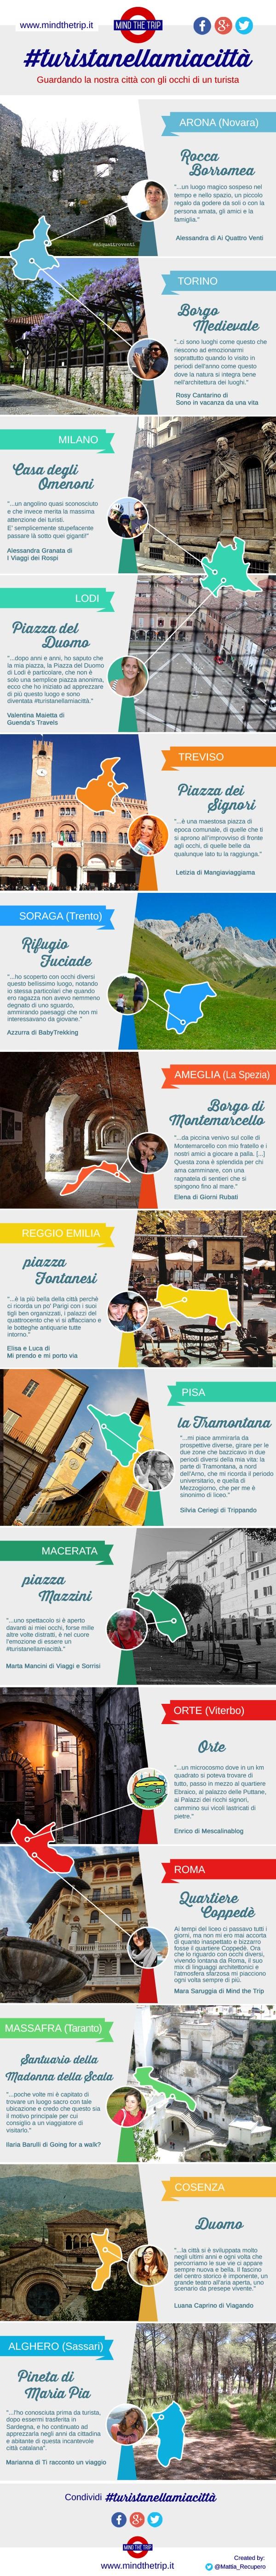 turistanellamiacitta-infografica